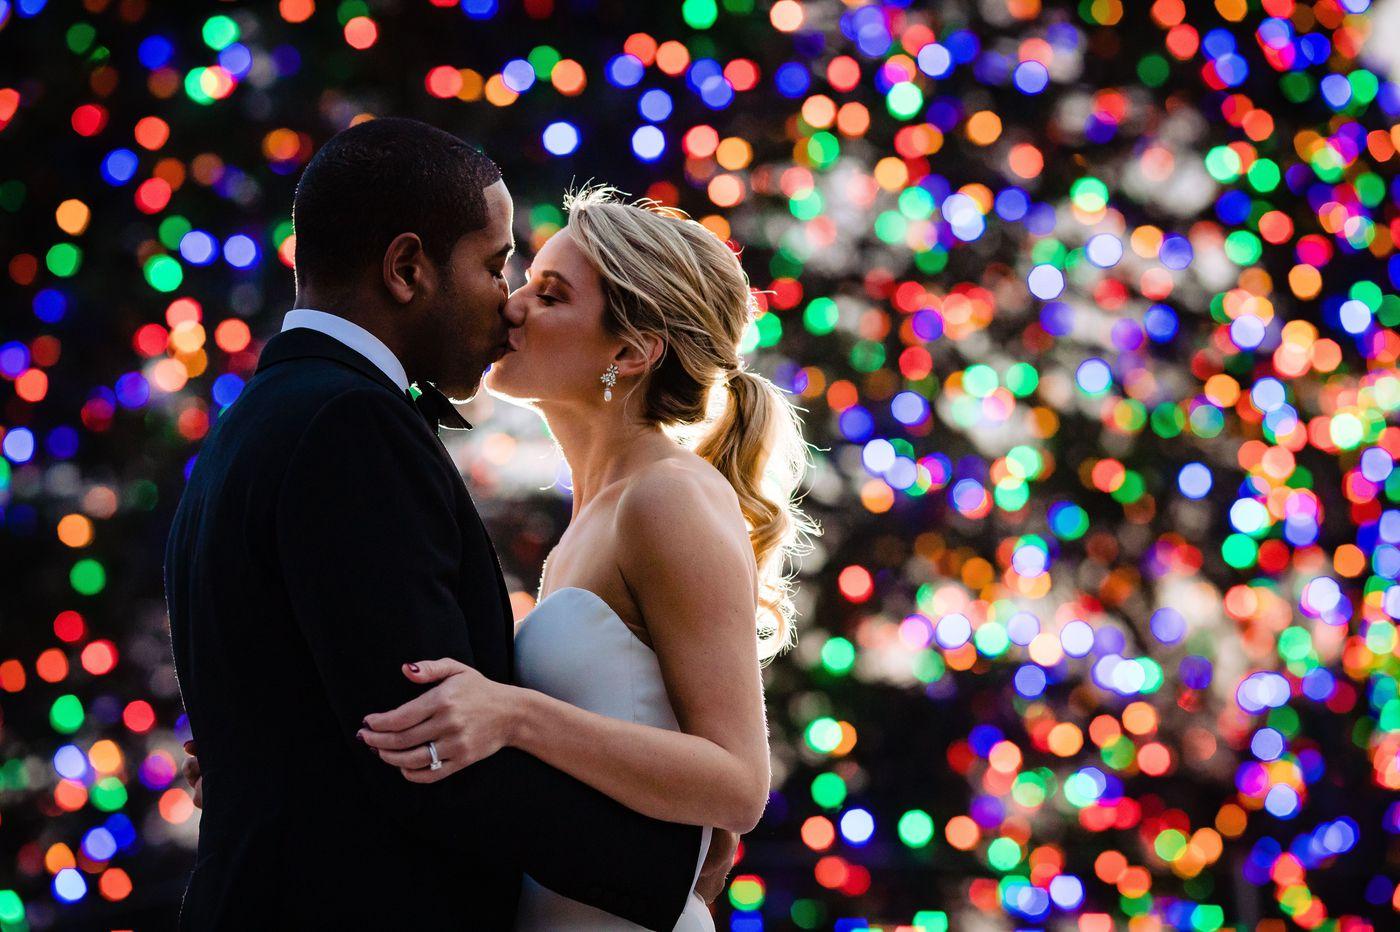 For Christina Zipf and BJ Glenn, being together is joyful